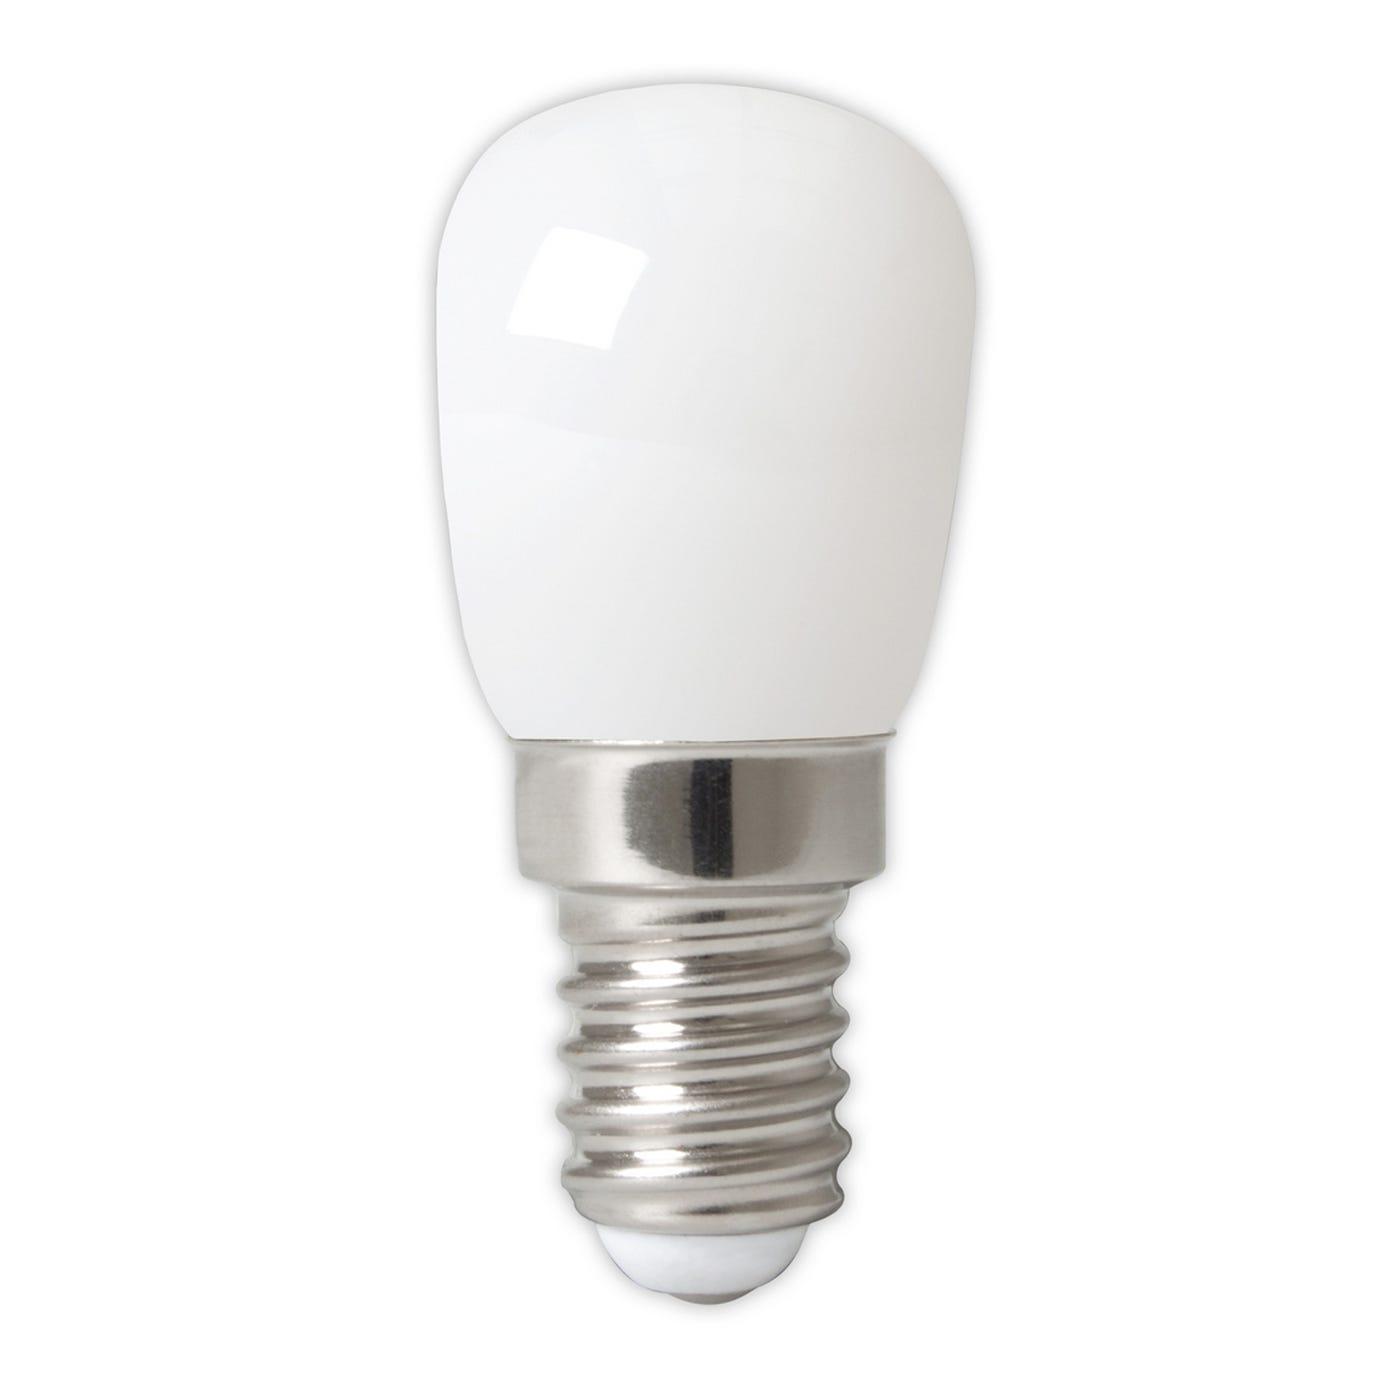 Softline Opal LED Filament Bulb 1W E14